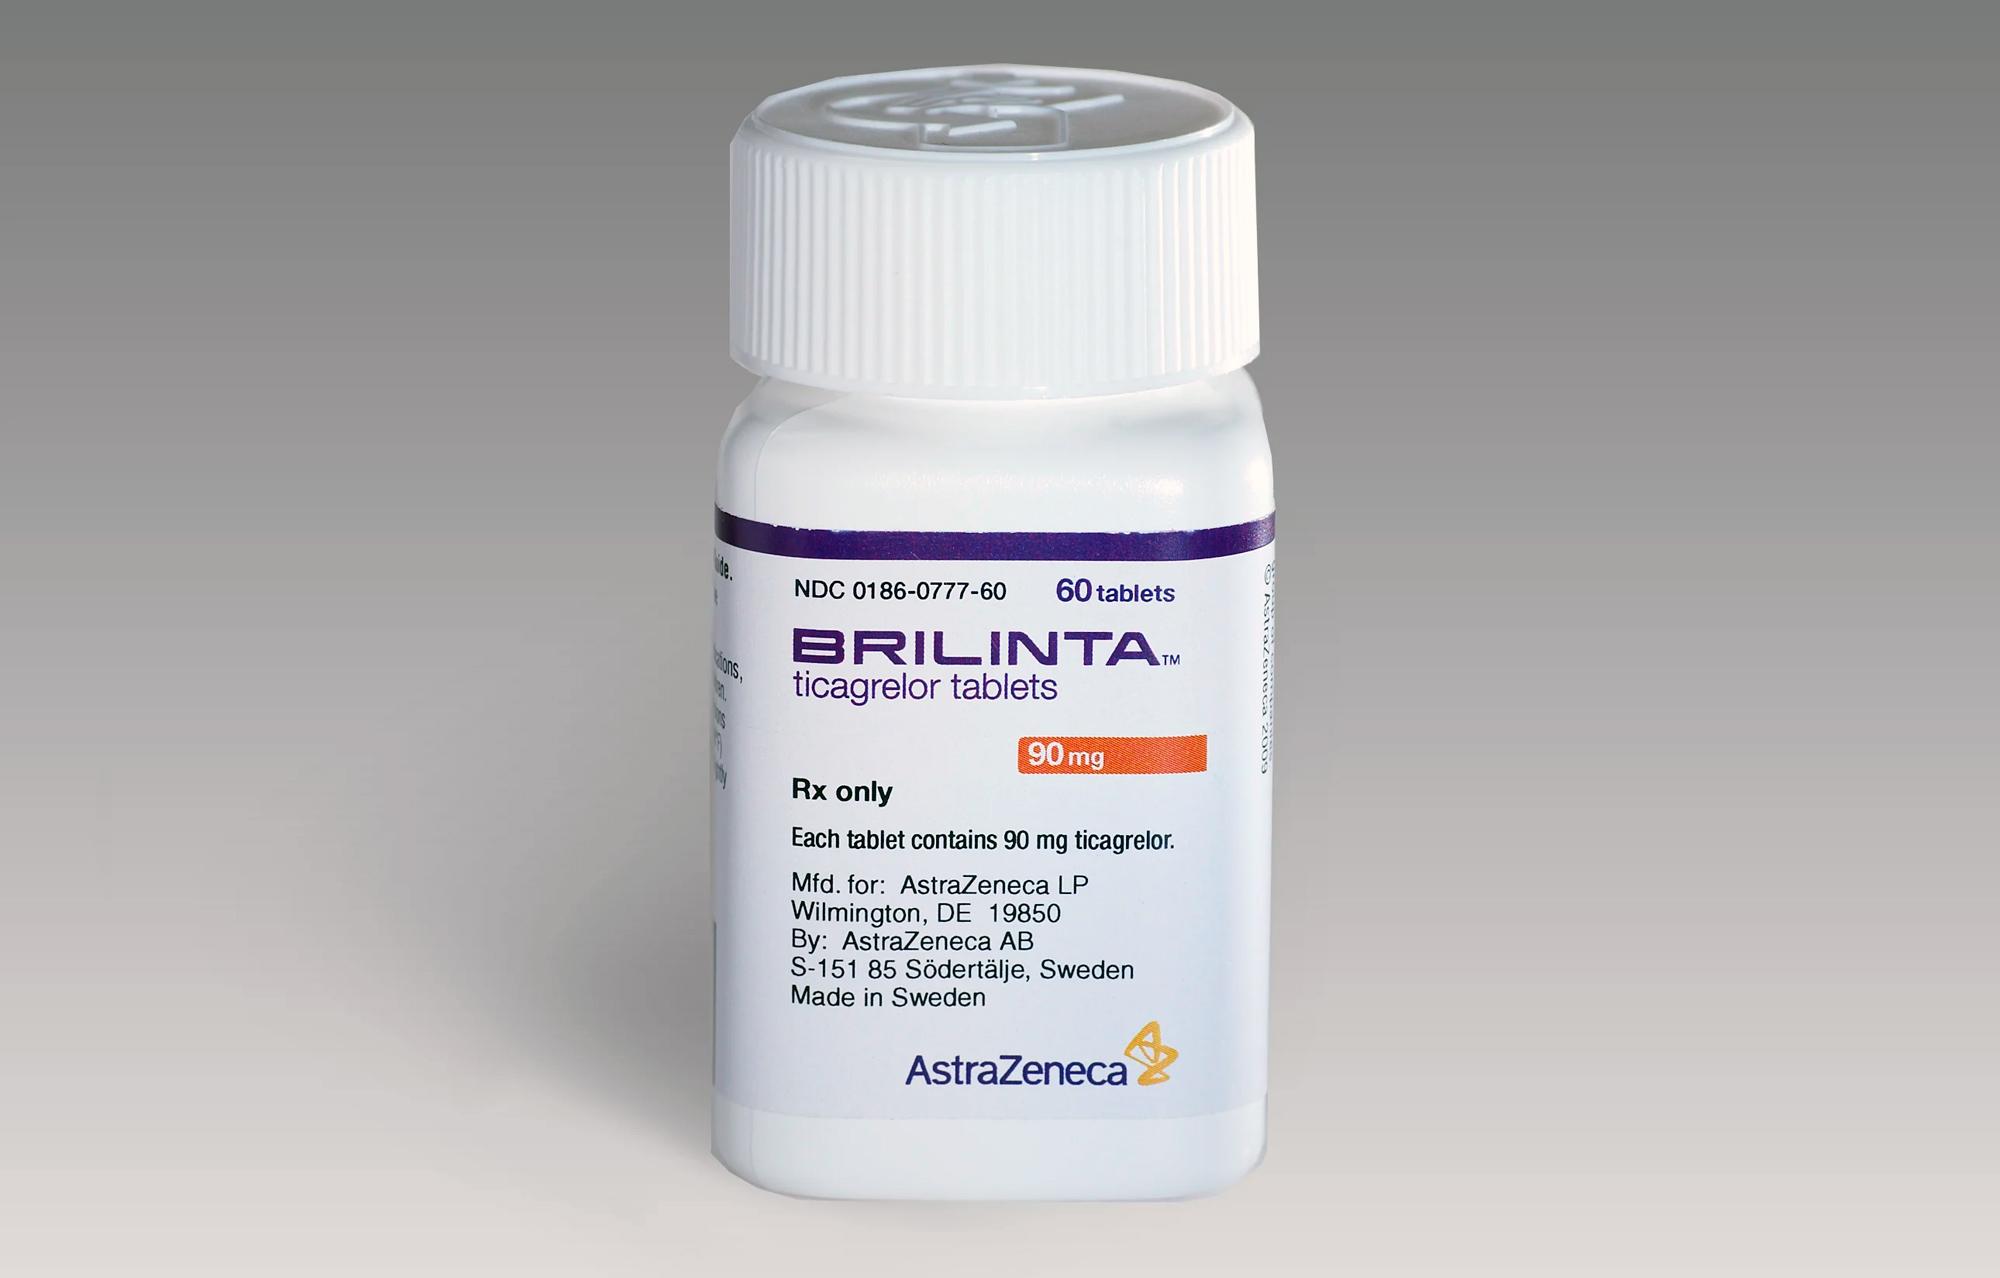 «Брилинта»/«Брилик» (Brilinta/Brilique, тикагрелор).